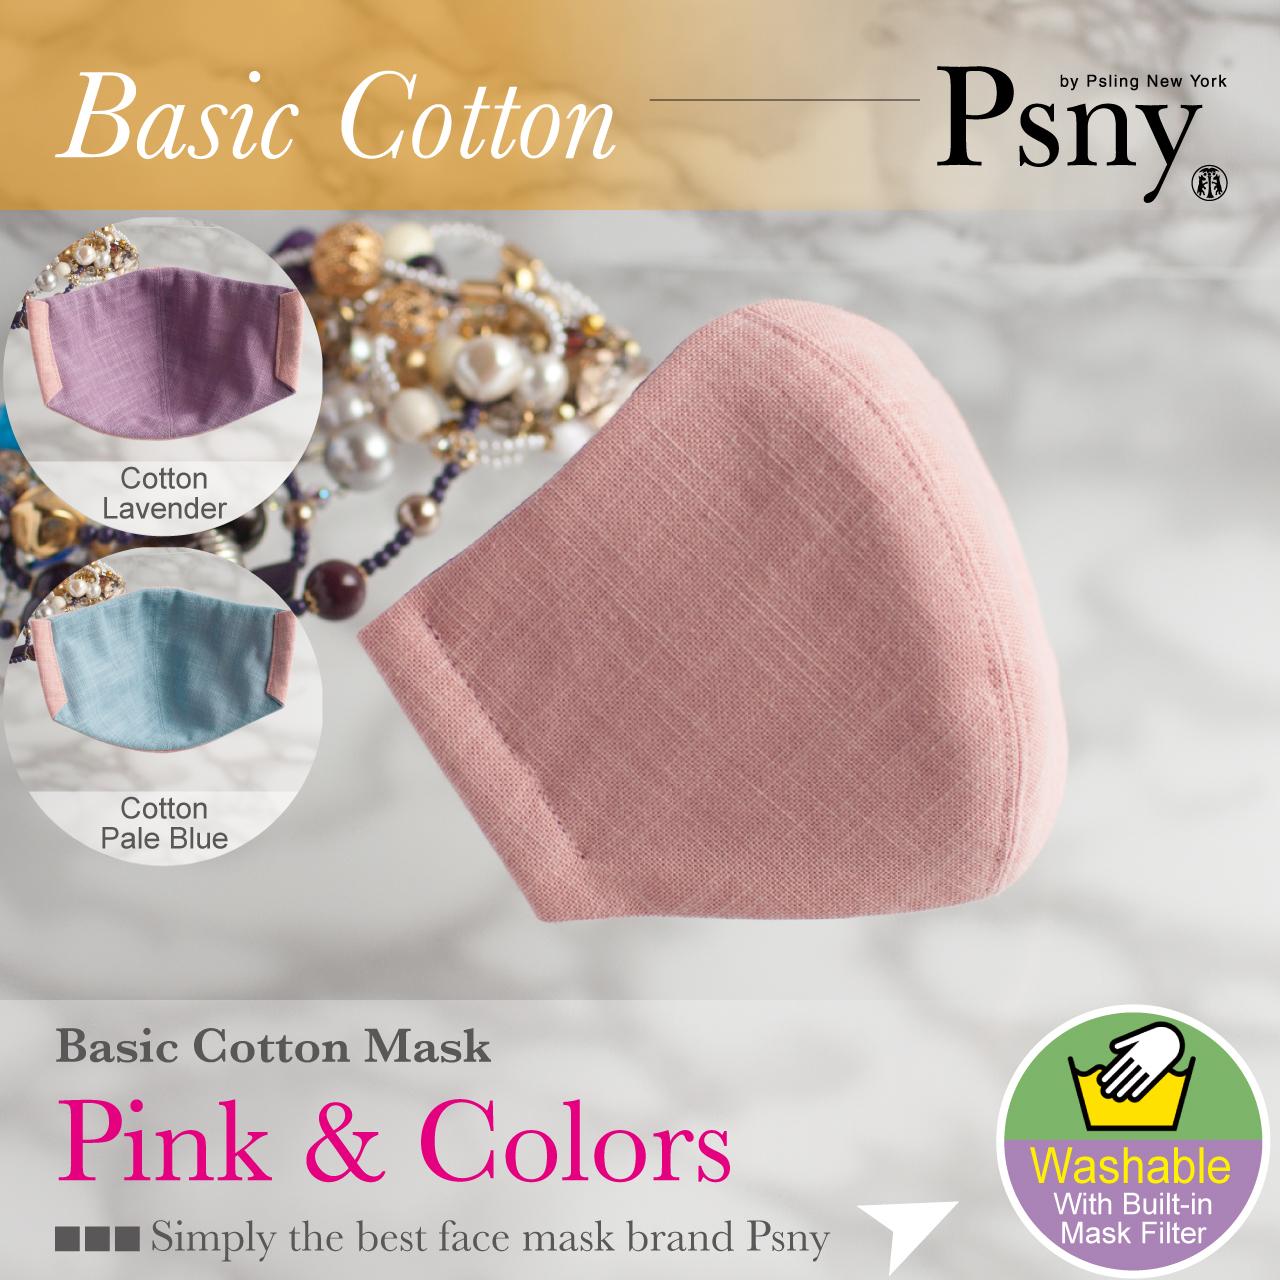 PSNY コットン・ピンク&カラーズ 花粉 黄砂 洗える不織布フィルター入り 大人用 立体 マスク 送料無料 CC7